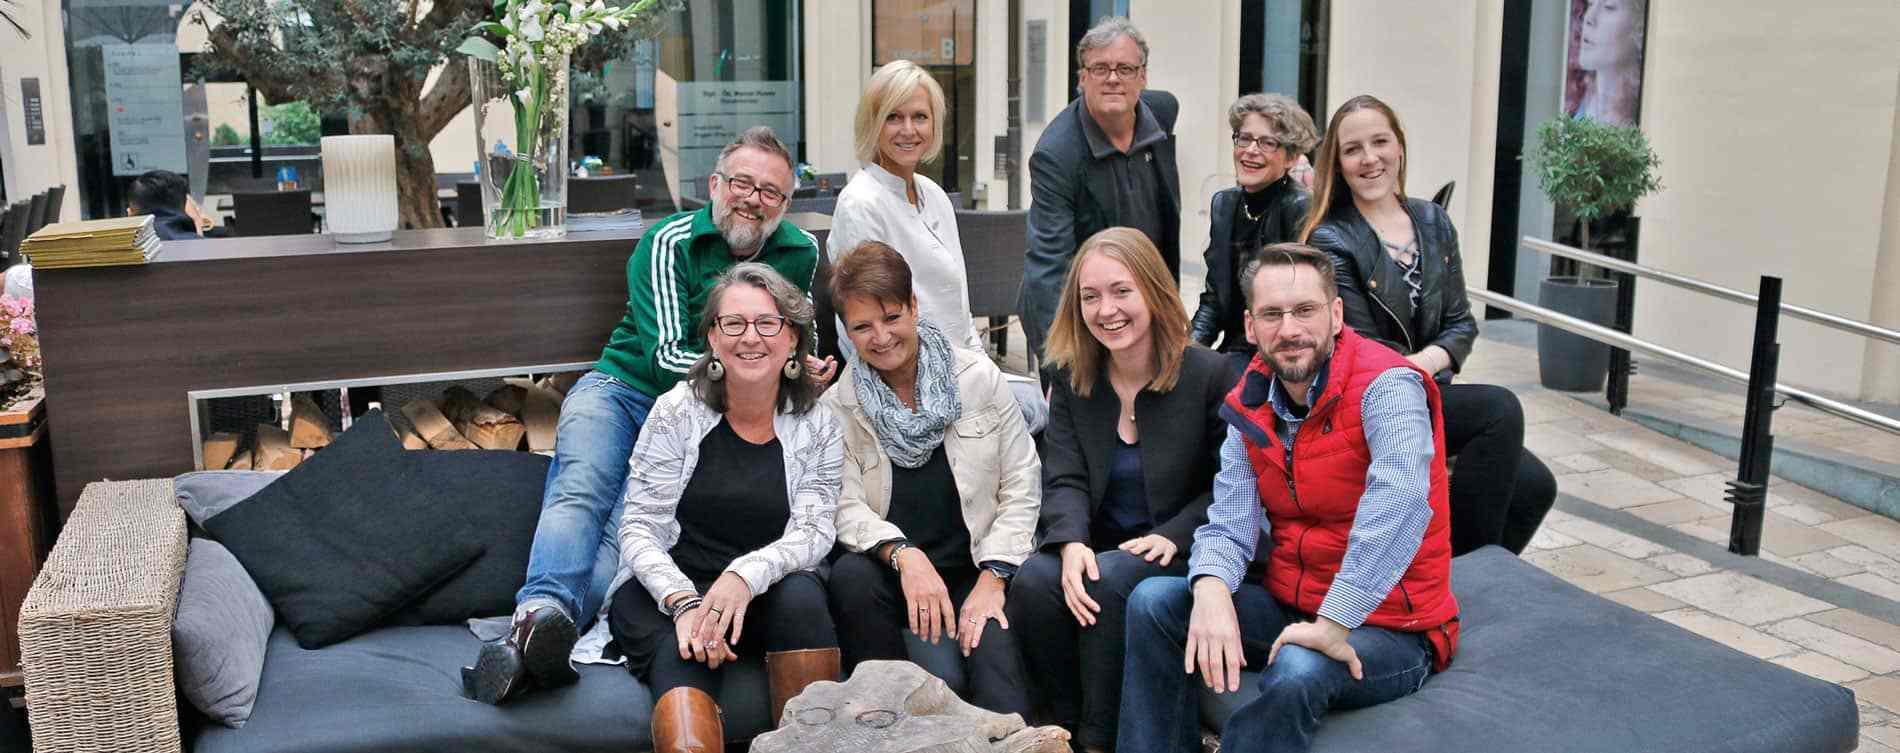 style hannover team - Kurse & Aktiv